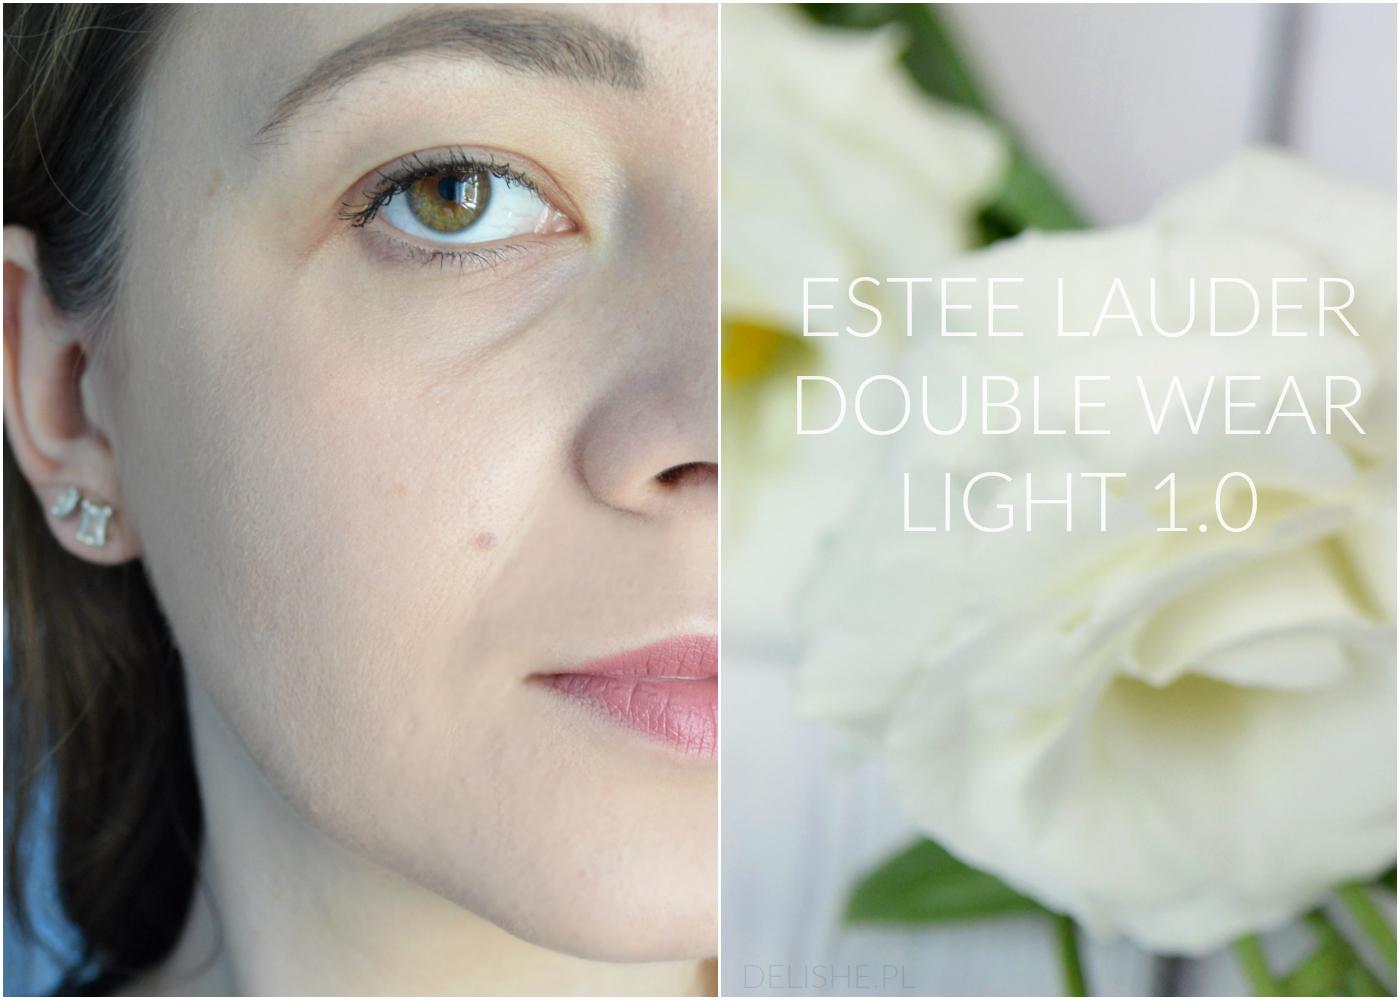 estee lauder double wear light 1.0